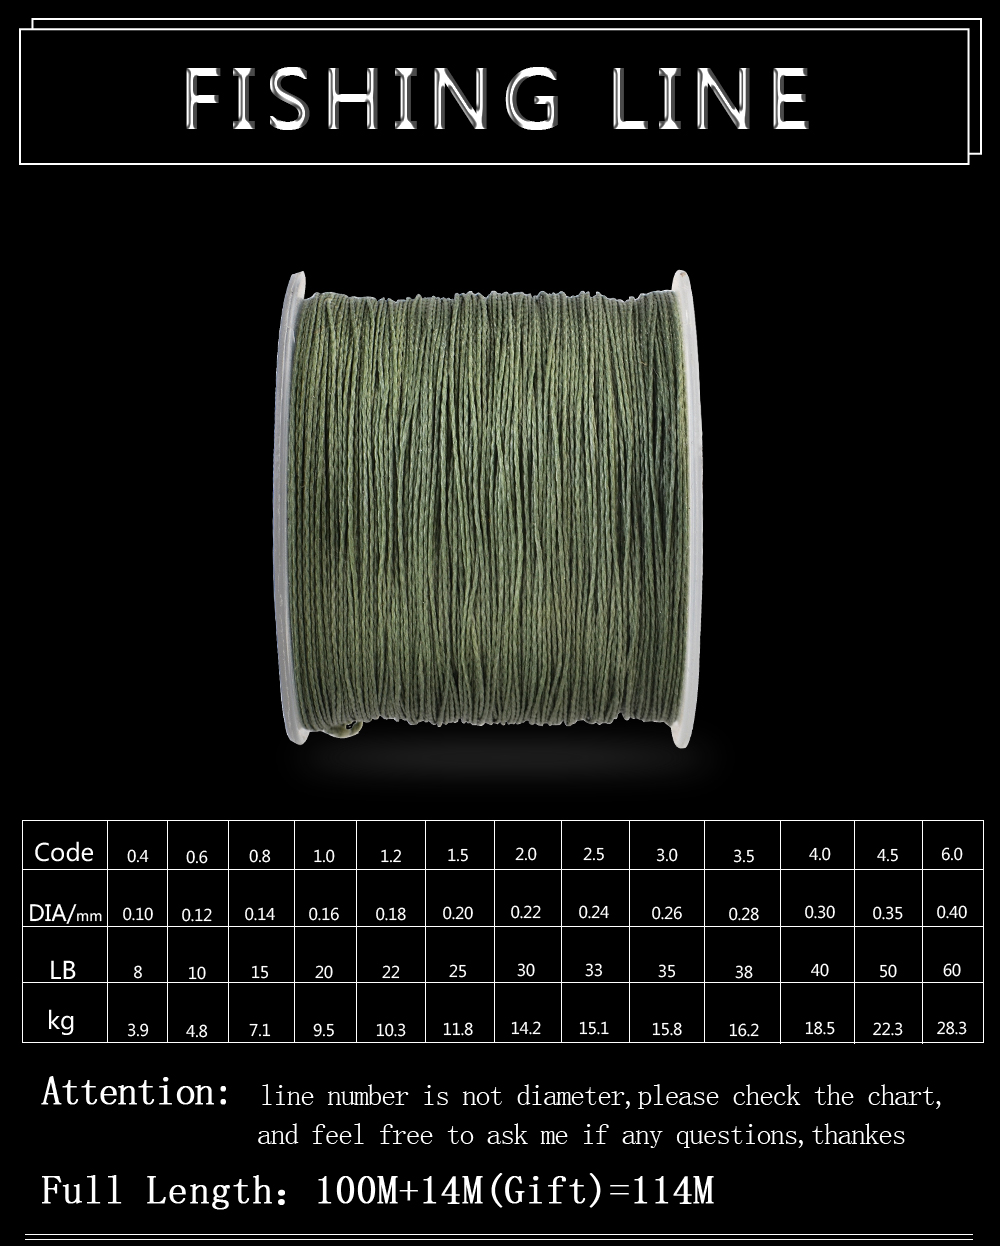 FTK braided fishing line